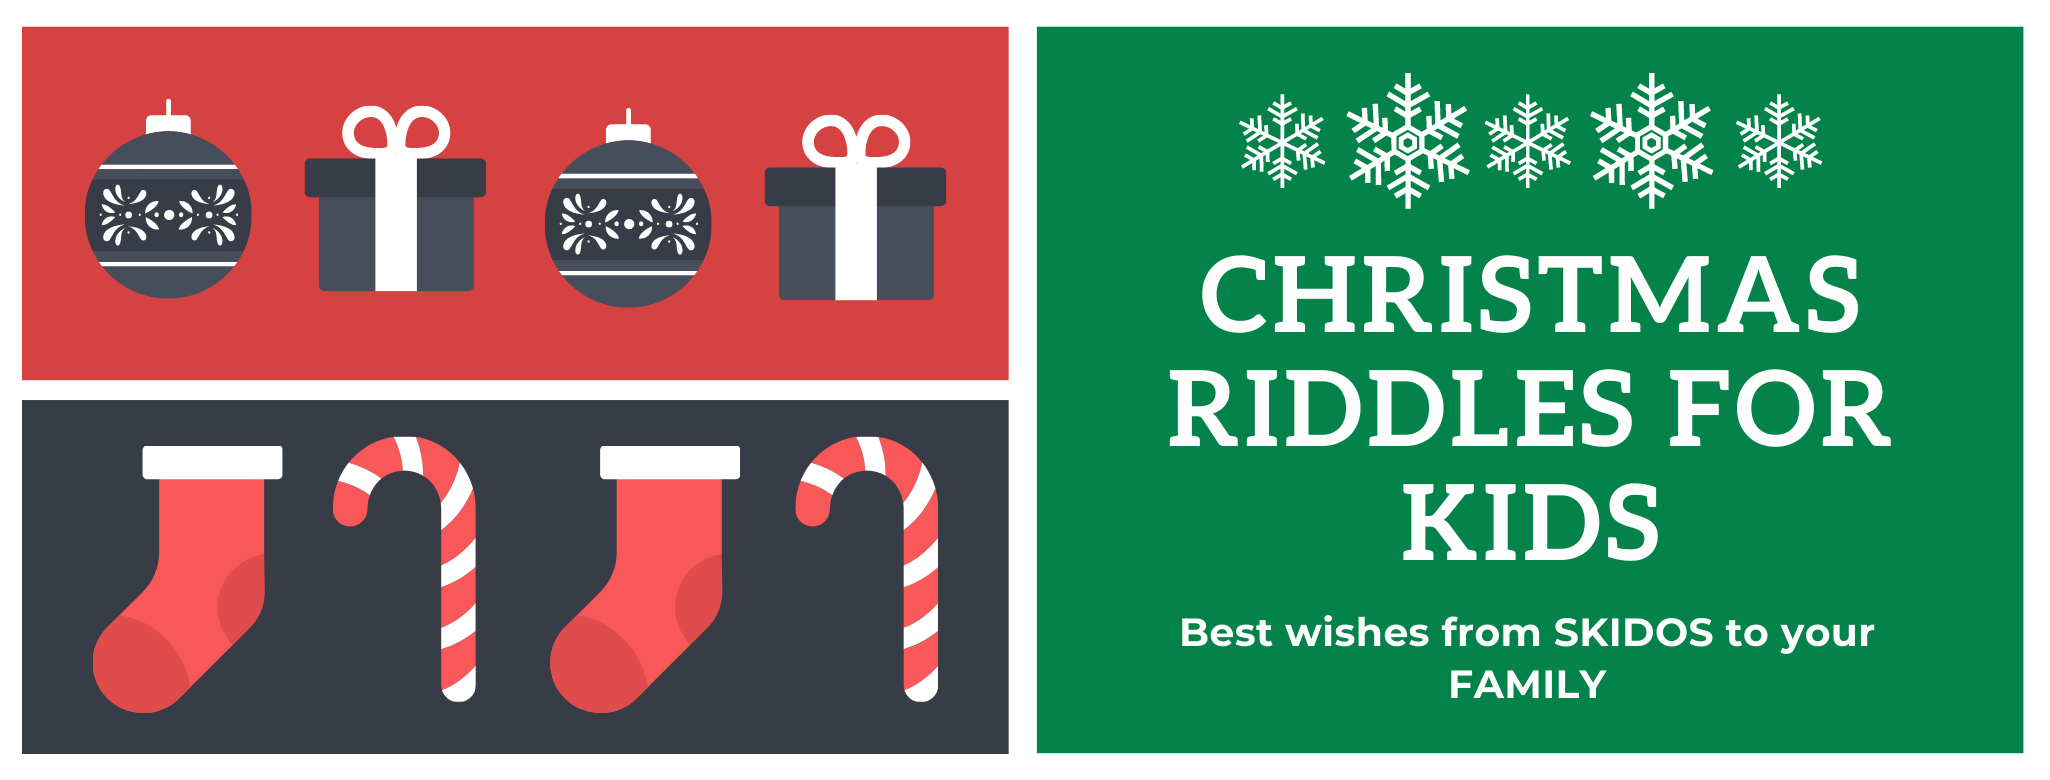 Christmas Riddles for Kids